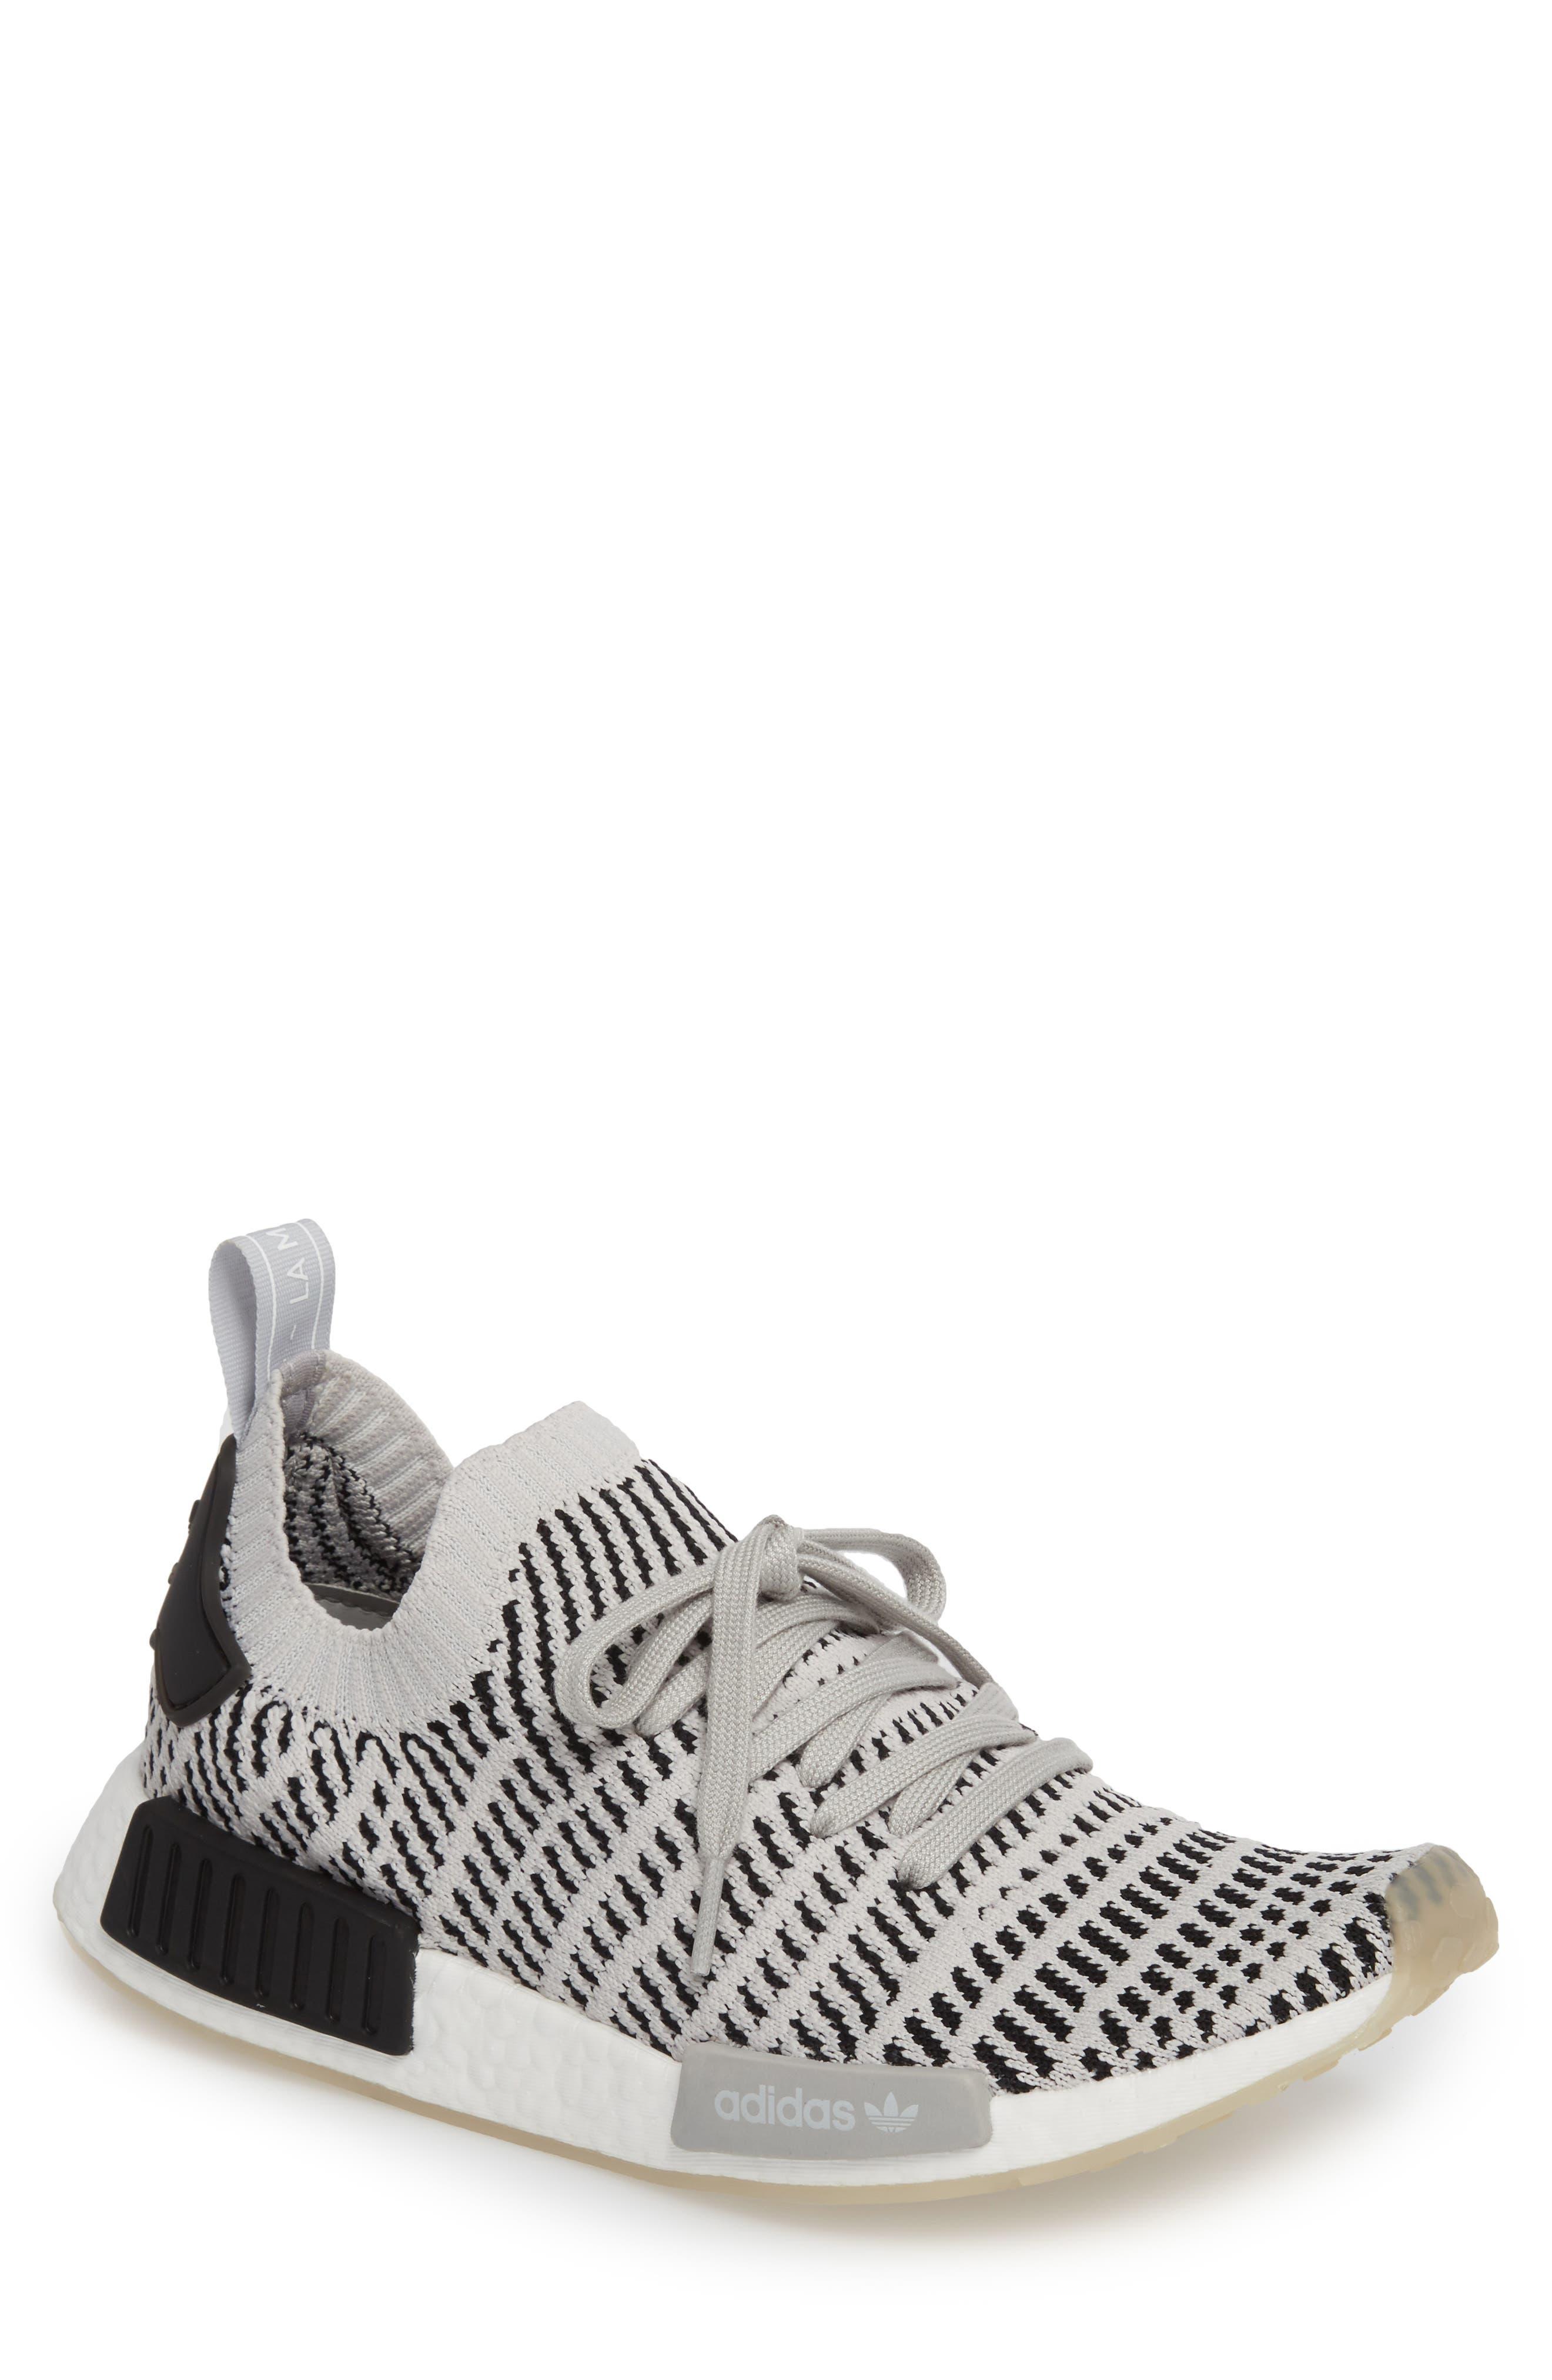 NMD R1 STLT Primeknit Sneaker,                         Main,                         color, 033